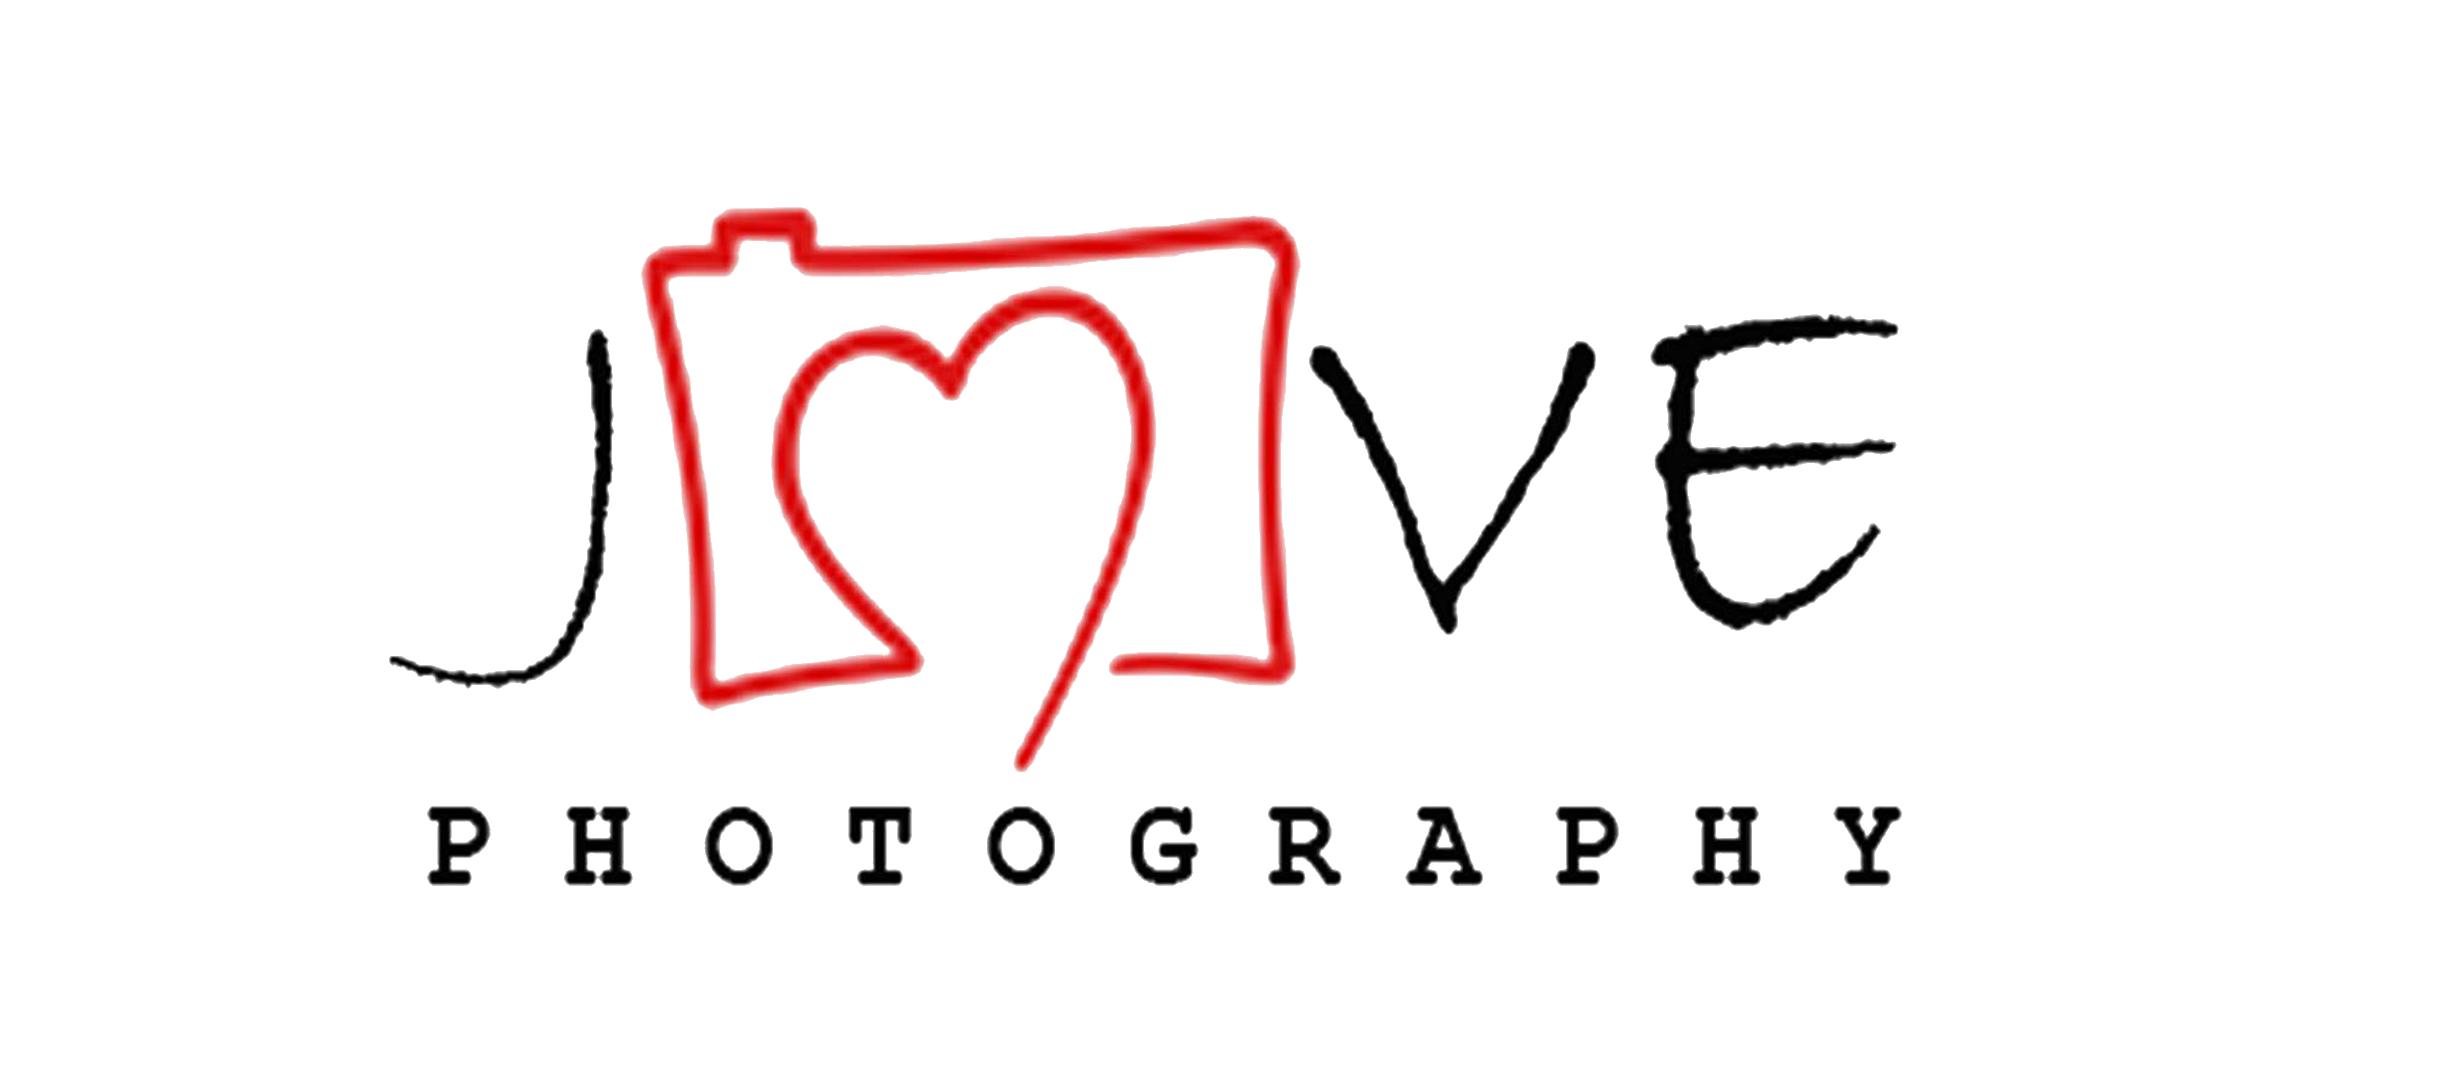 Jove_logo_tiff